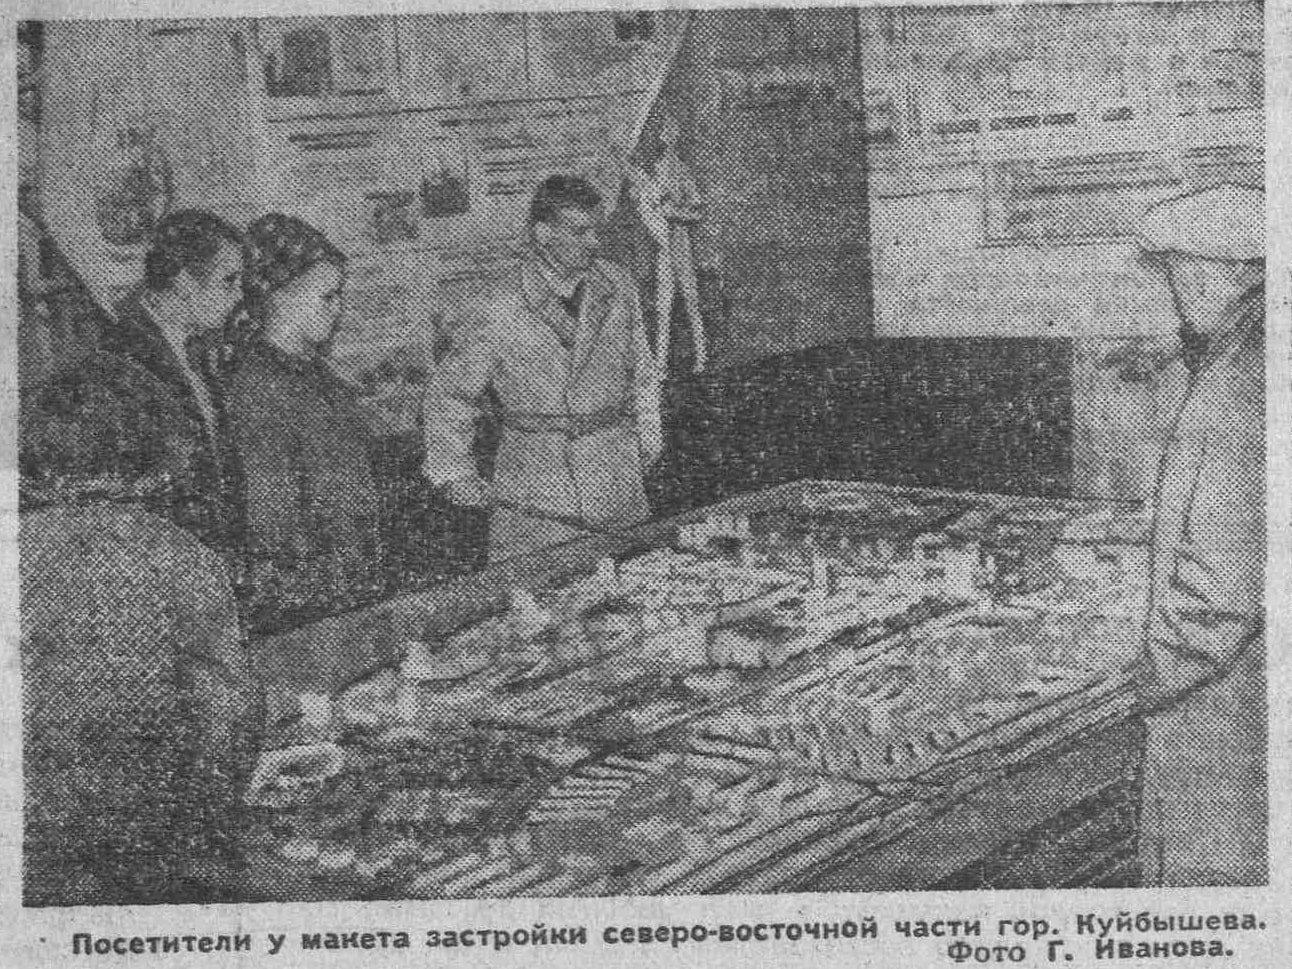 Стара Загора-ФОТО-003-ВКа-1965-11-05-макет СВ мкр-min